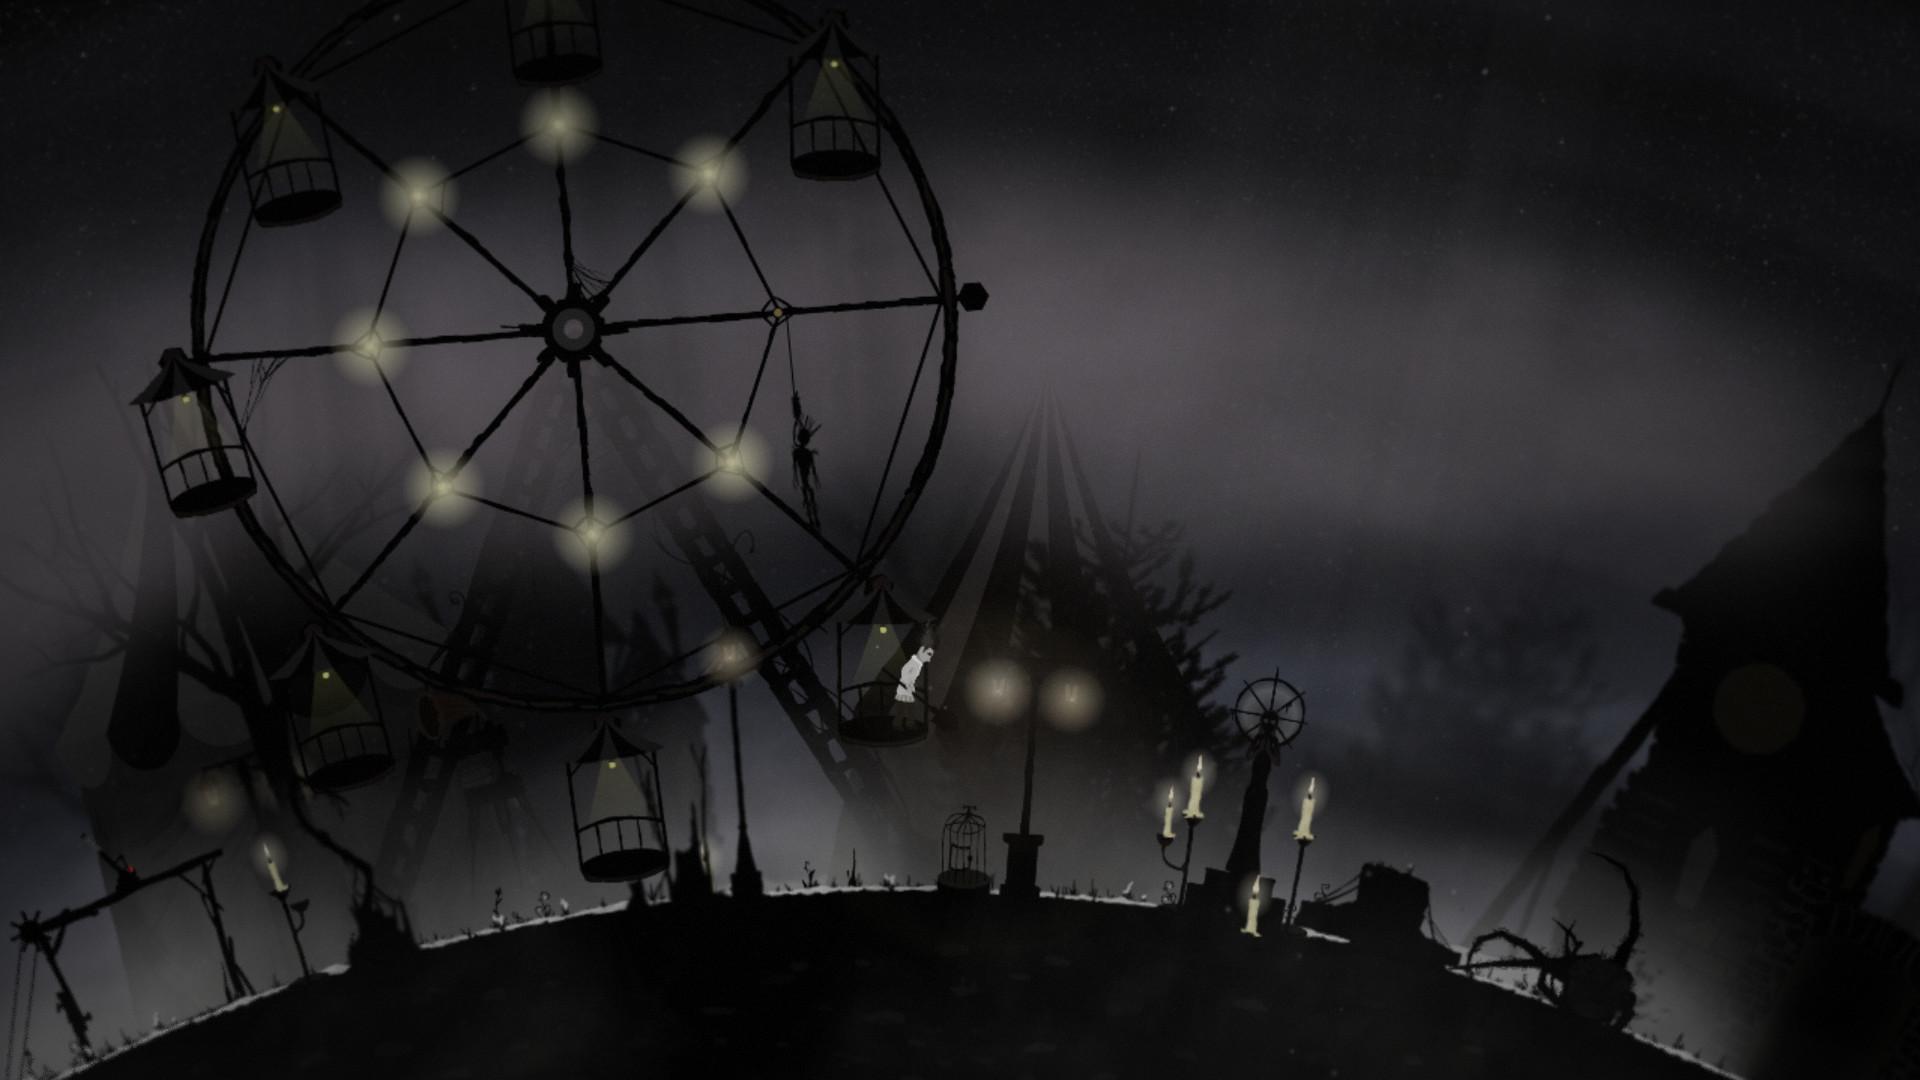 world-of-one-holistic-edition-pc-screenshot-2